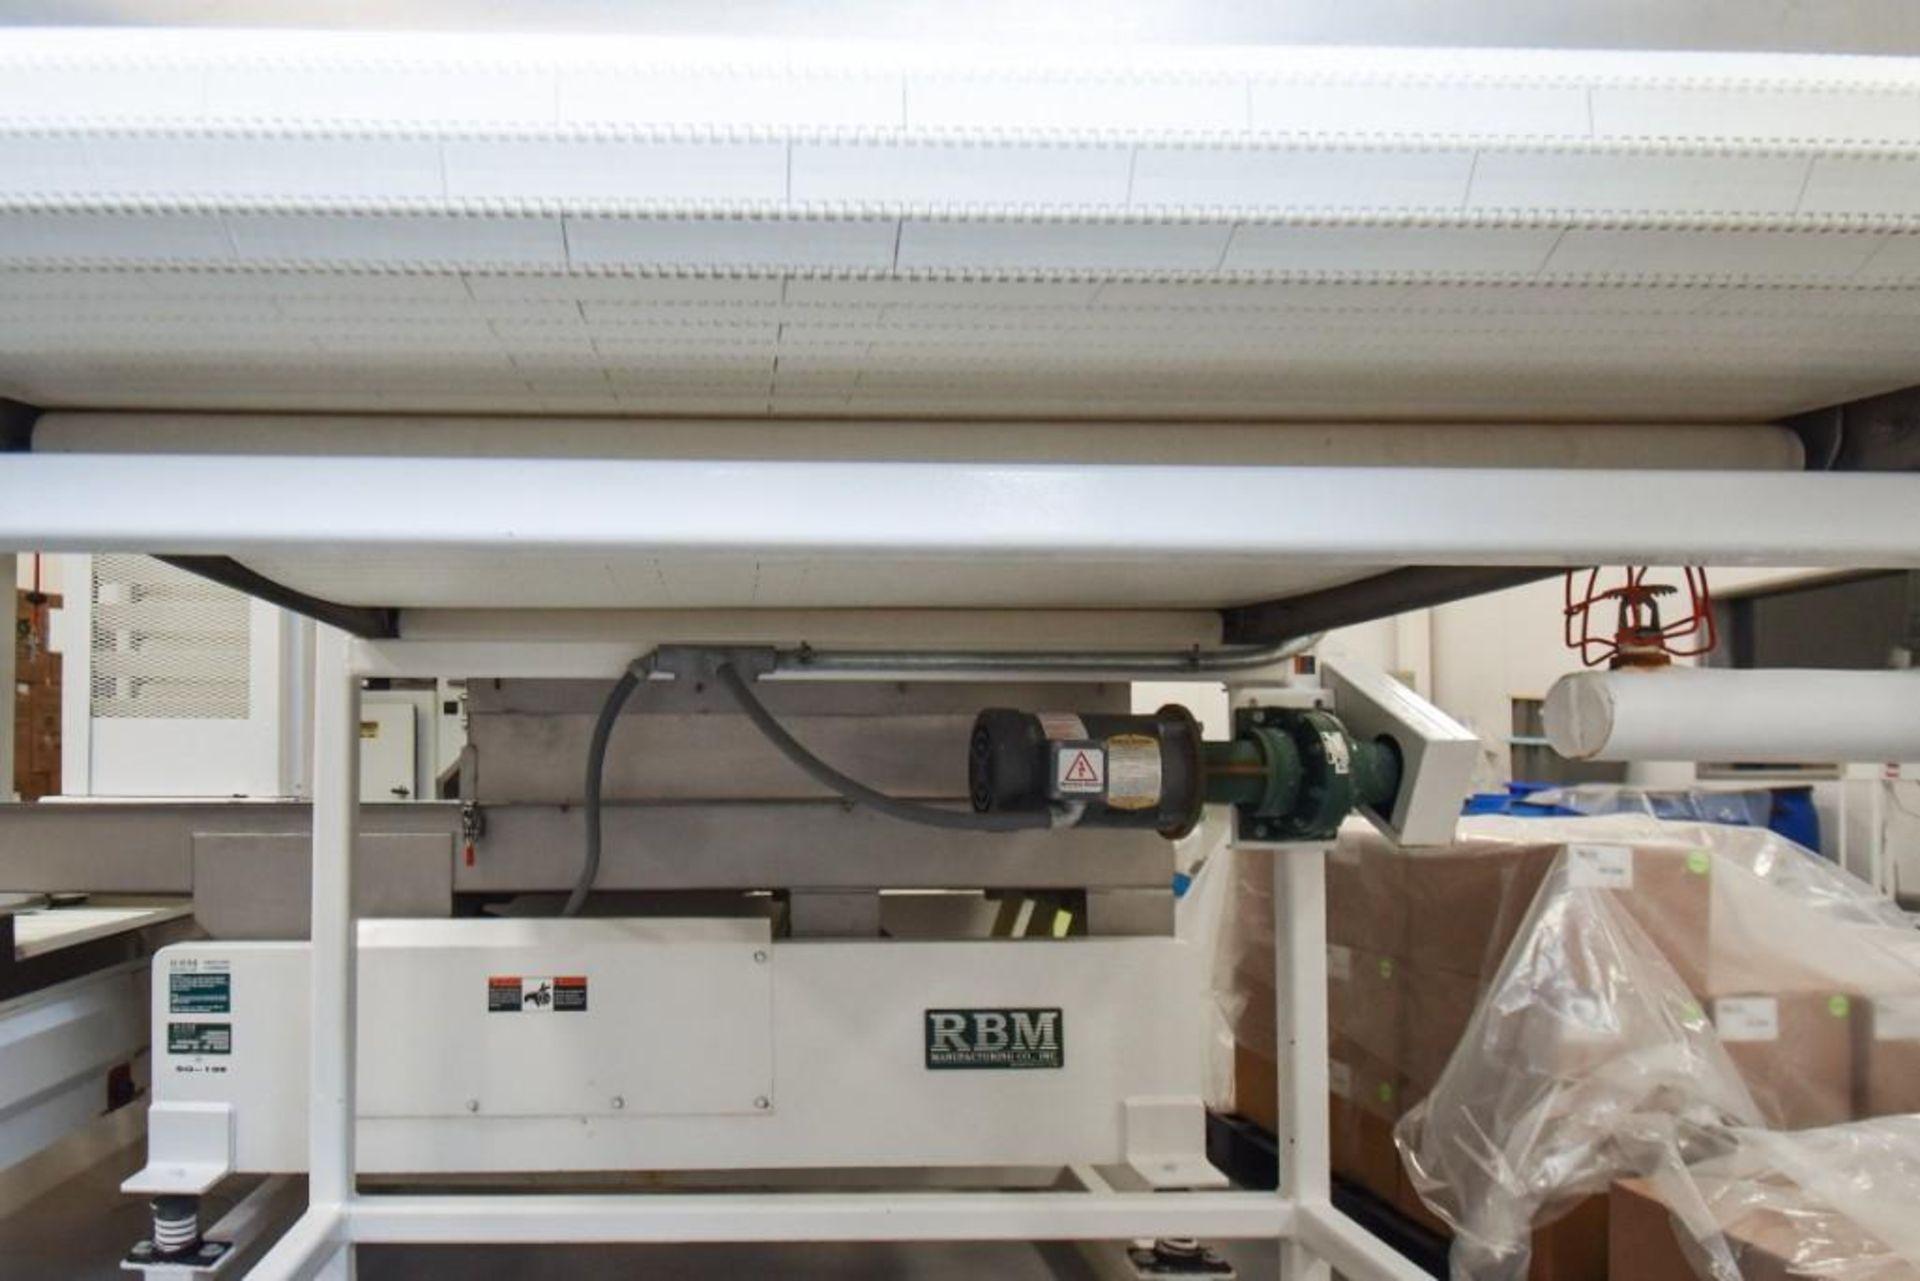 RBM Accumulation Hopper Conveyor and Vibratory Deck AC-1-4X4-6 - Image 3 of 11